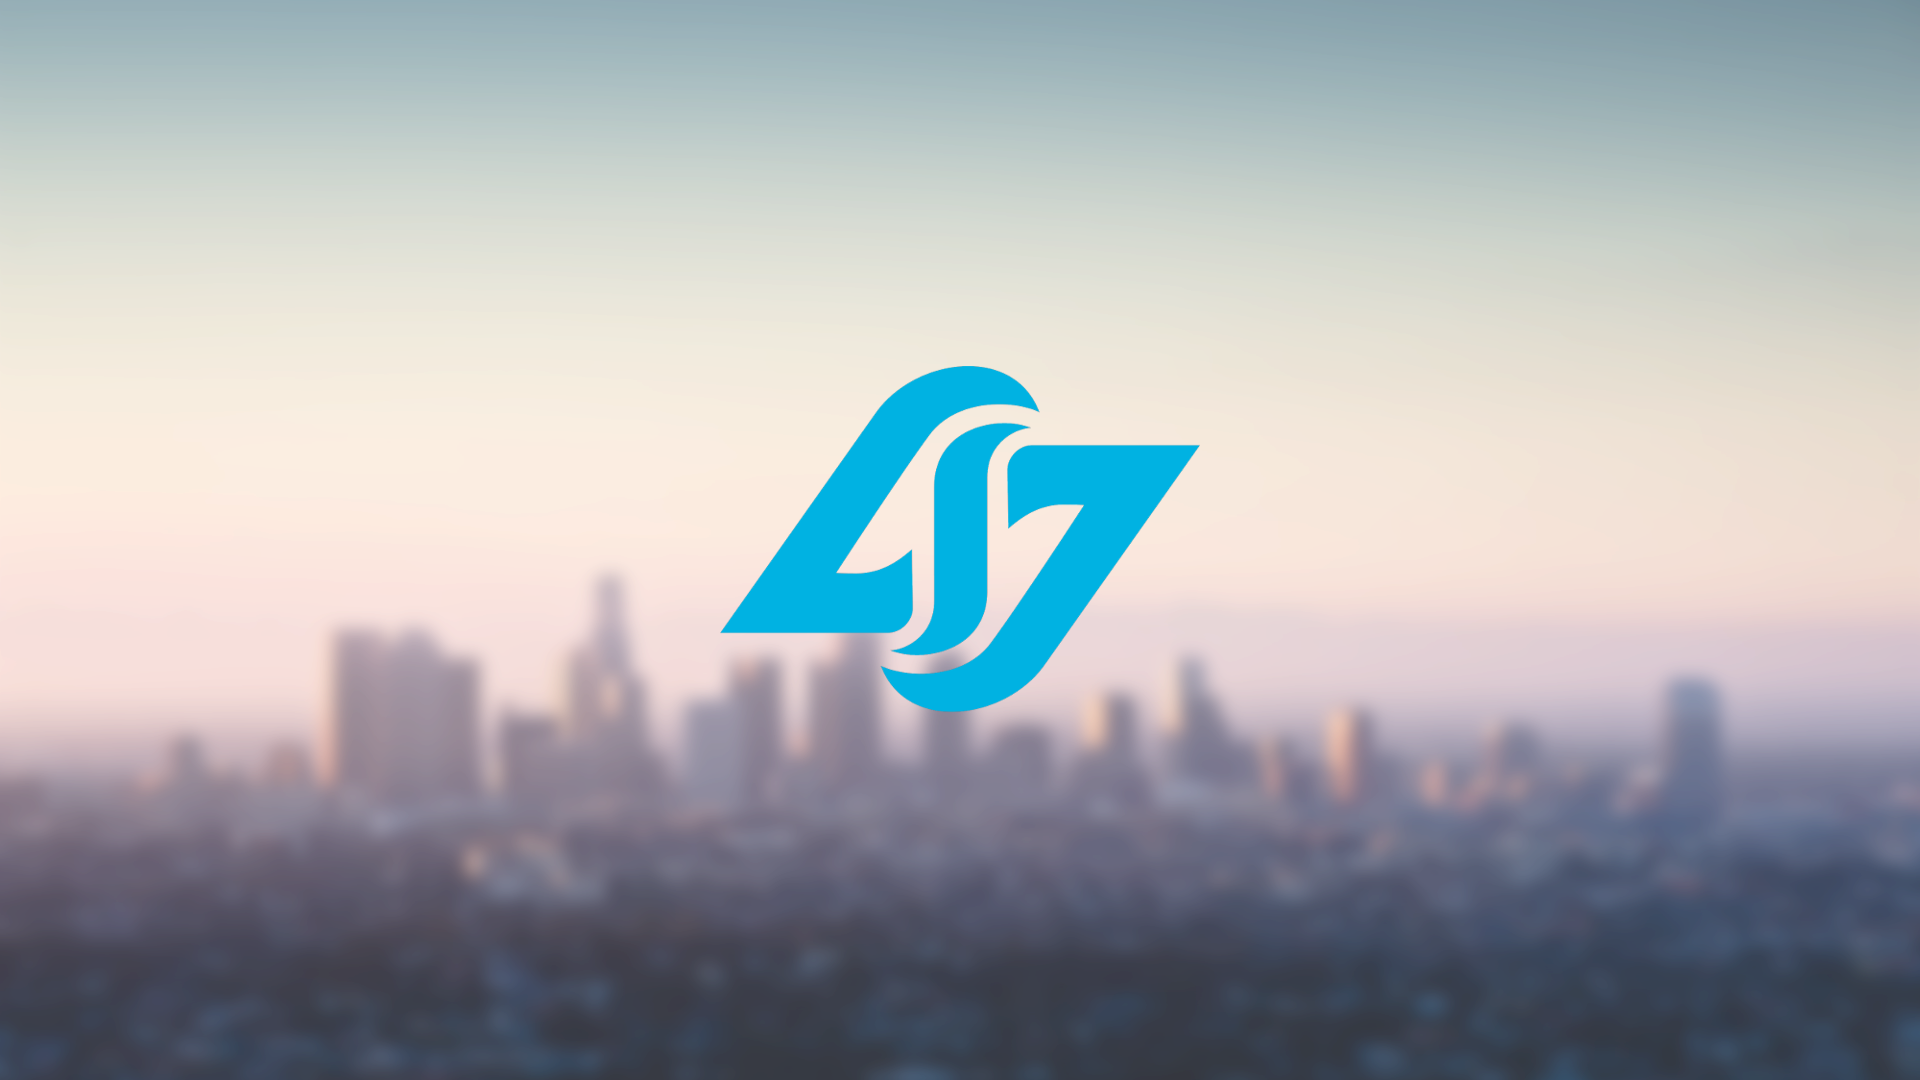 CLG / Los Angeles